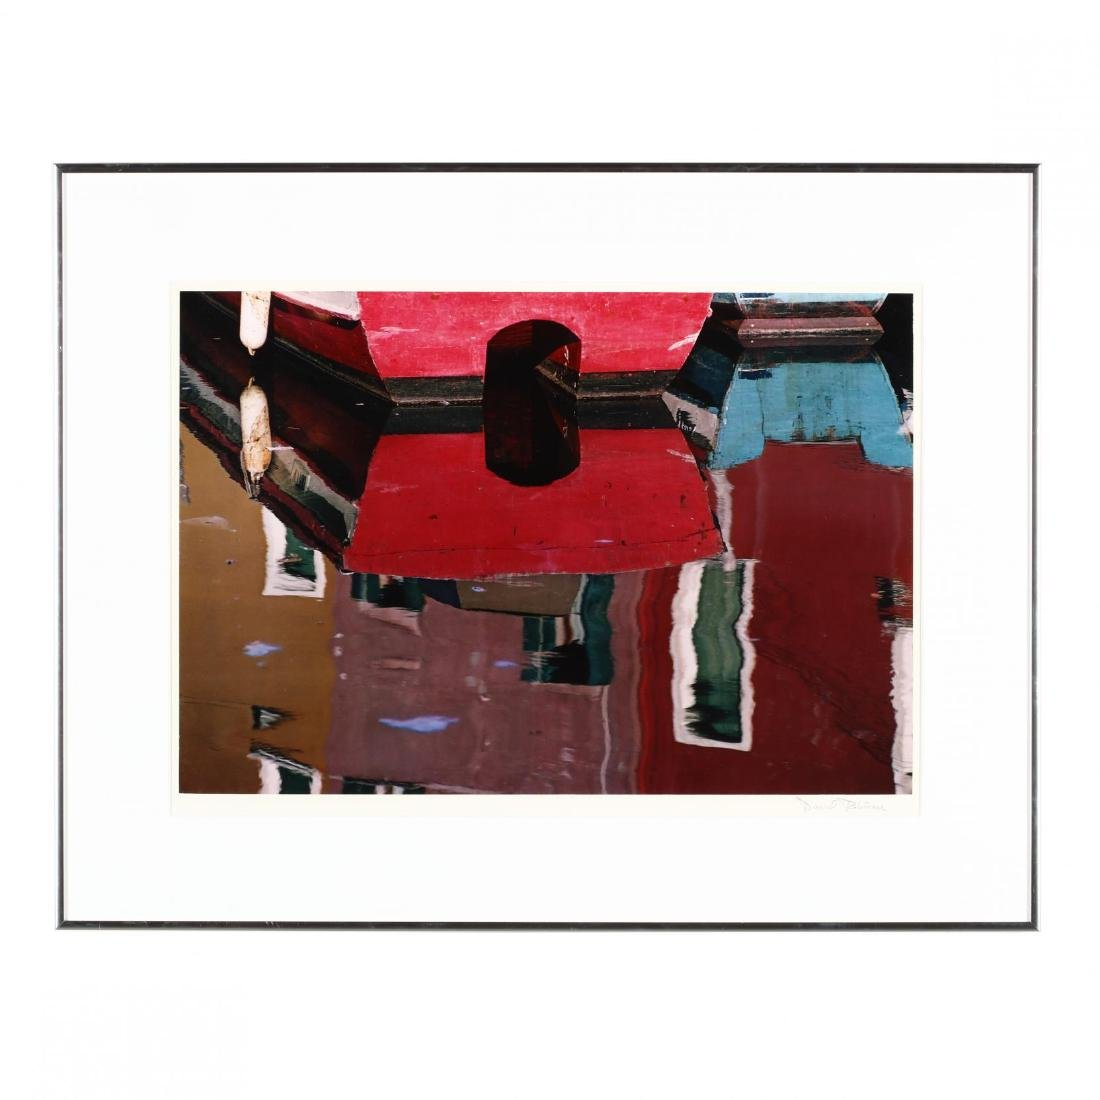 David Robinson (20th/21st Century),  Red Boat, Burano